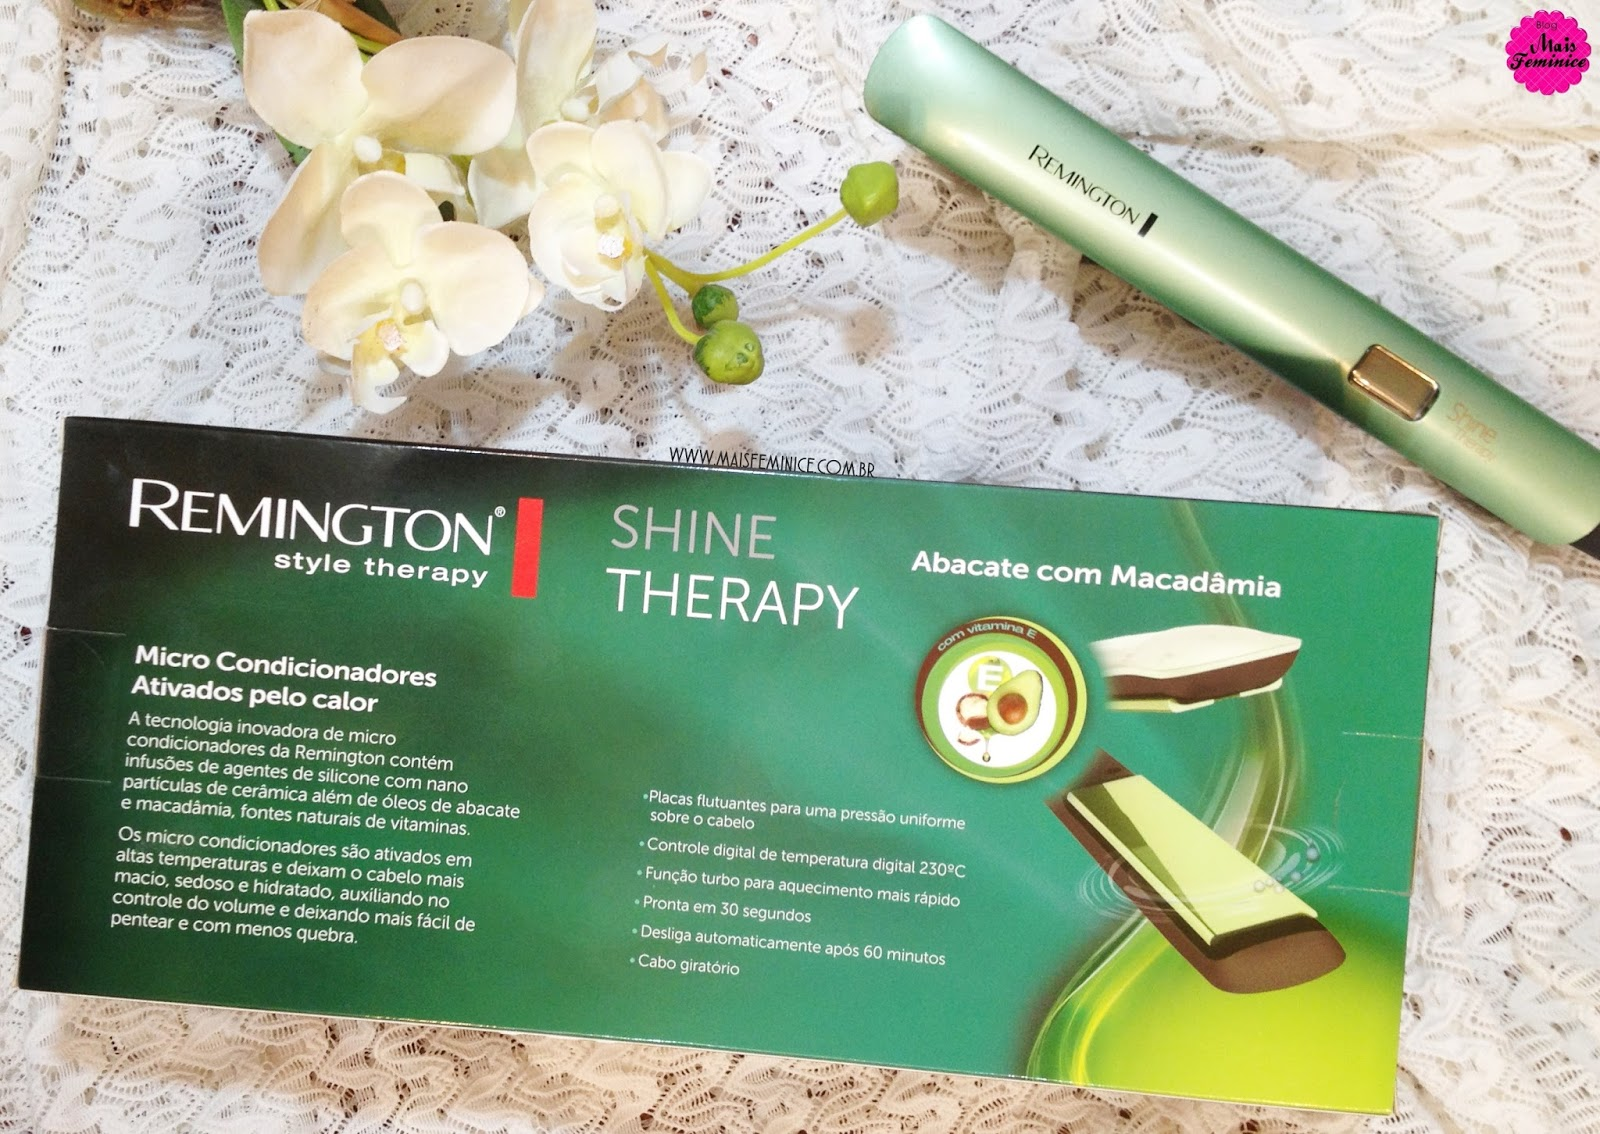 Prancha Shine Therapy da Remington